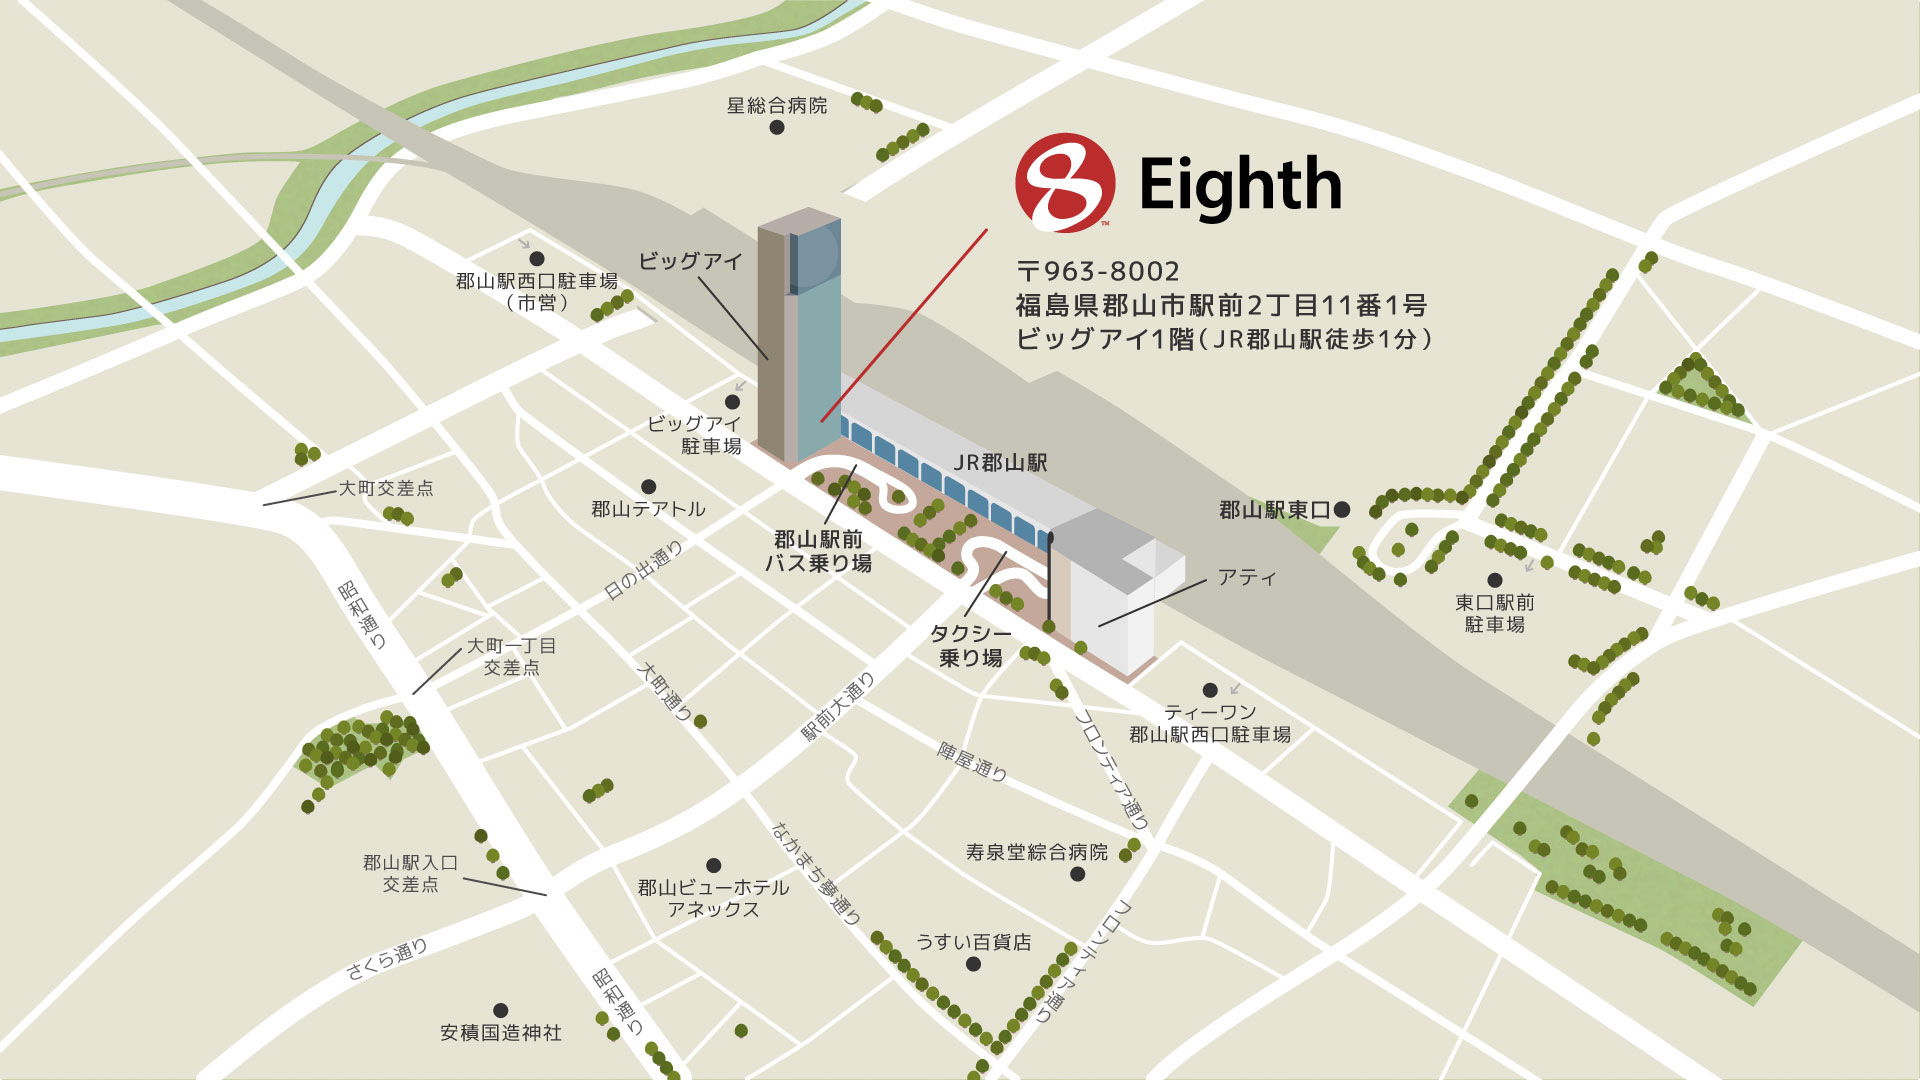 Eighth Inc. (エイス)への地図